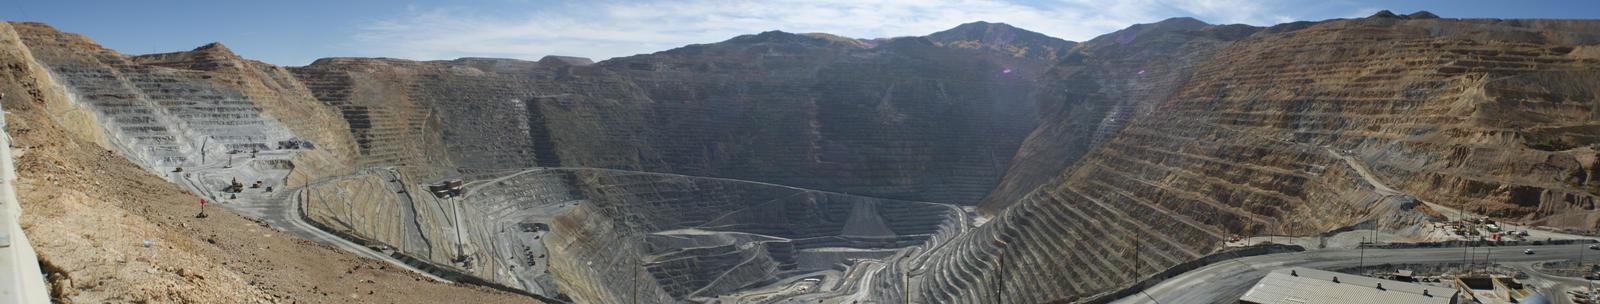 Rio Tinto Kennecott Bingham Canyon Copper Mine. by Syagria